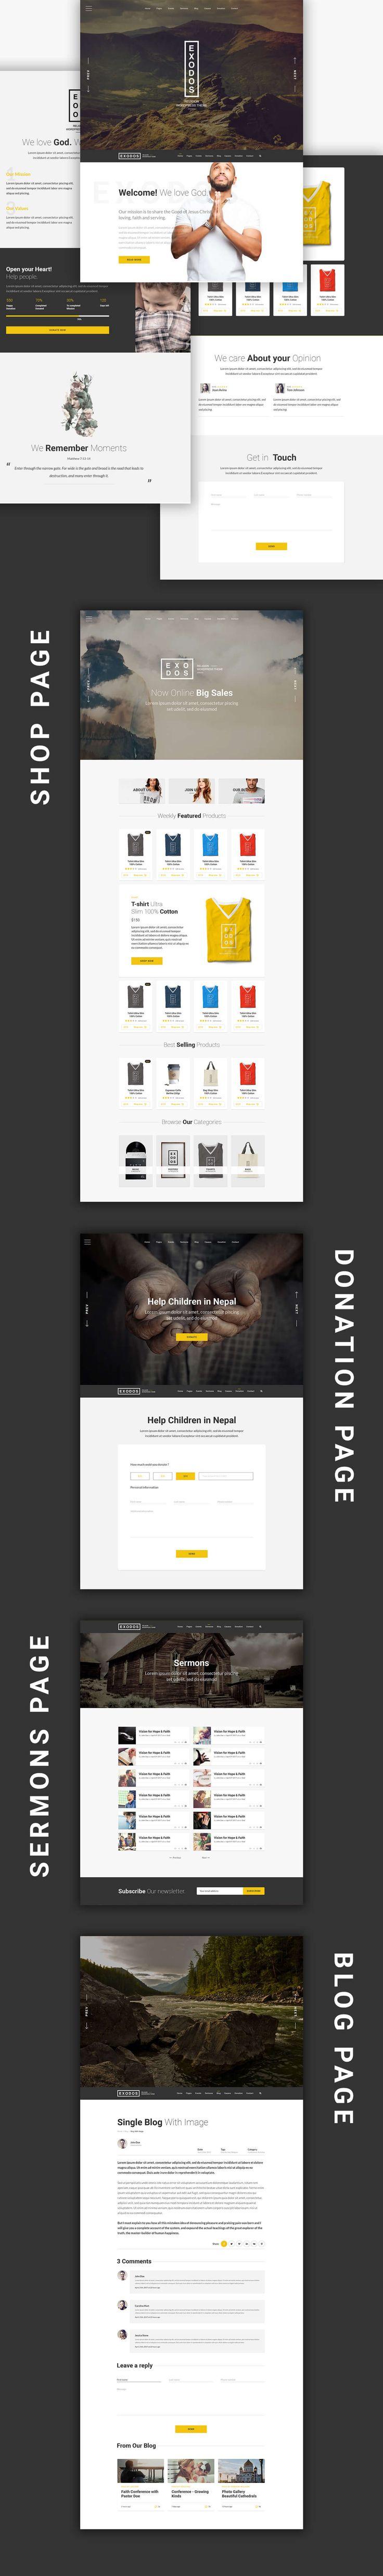 Exodos - Church WordPress Theme by modeltheme | ThemeForest